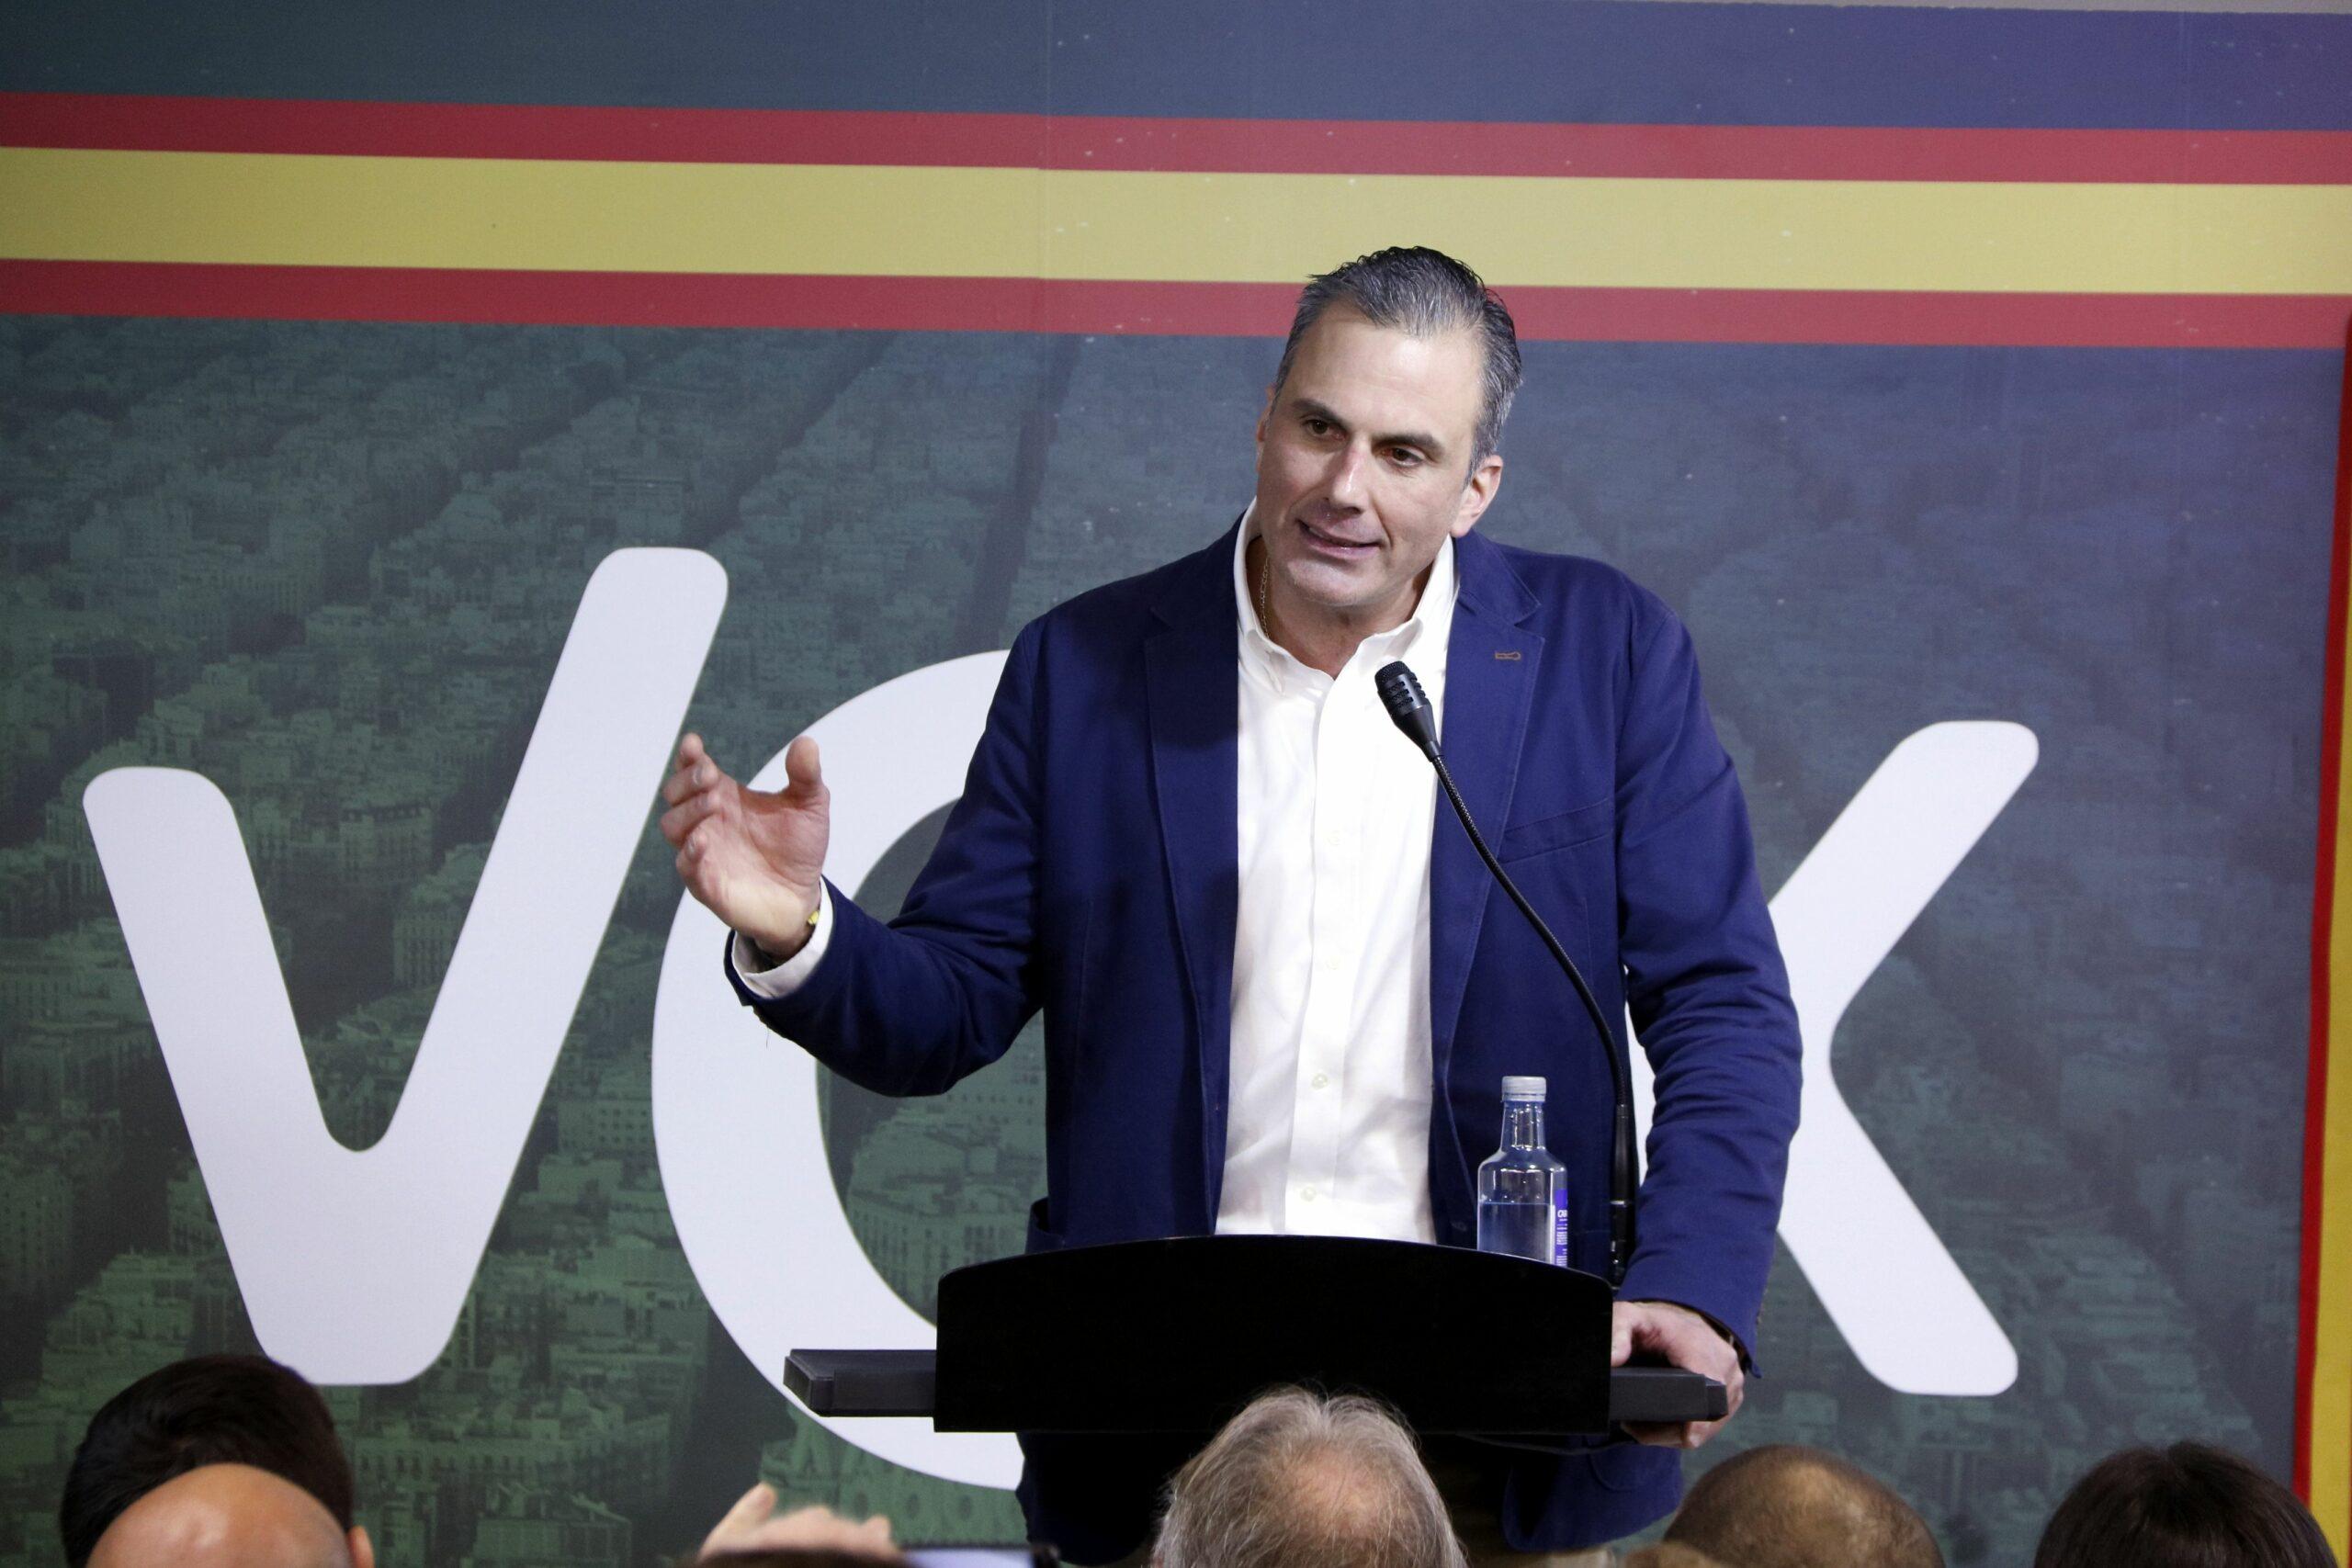 El secretari general de VOX, Javier Ortega Smith